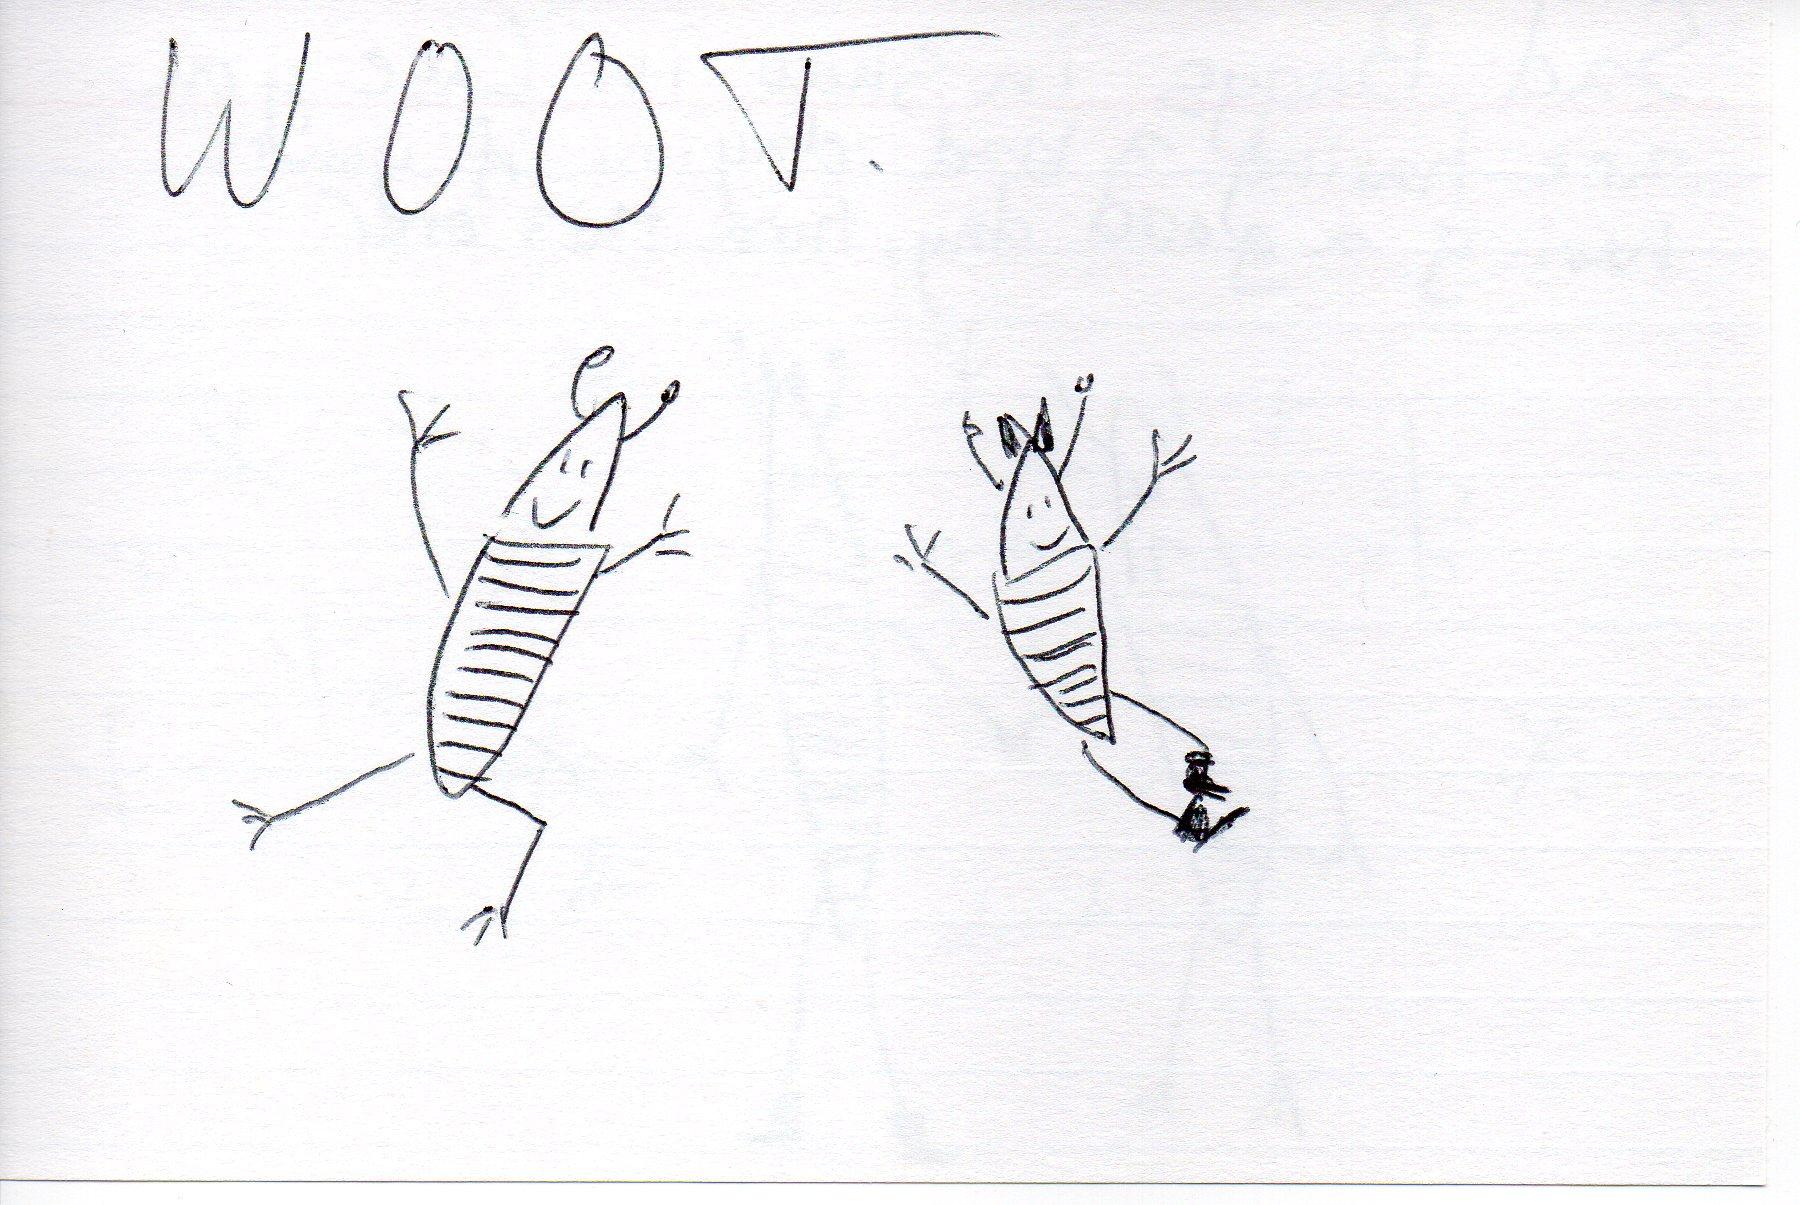 WOOT [click to embiggen]